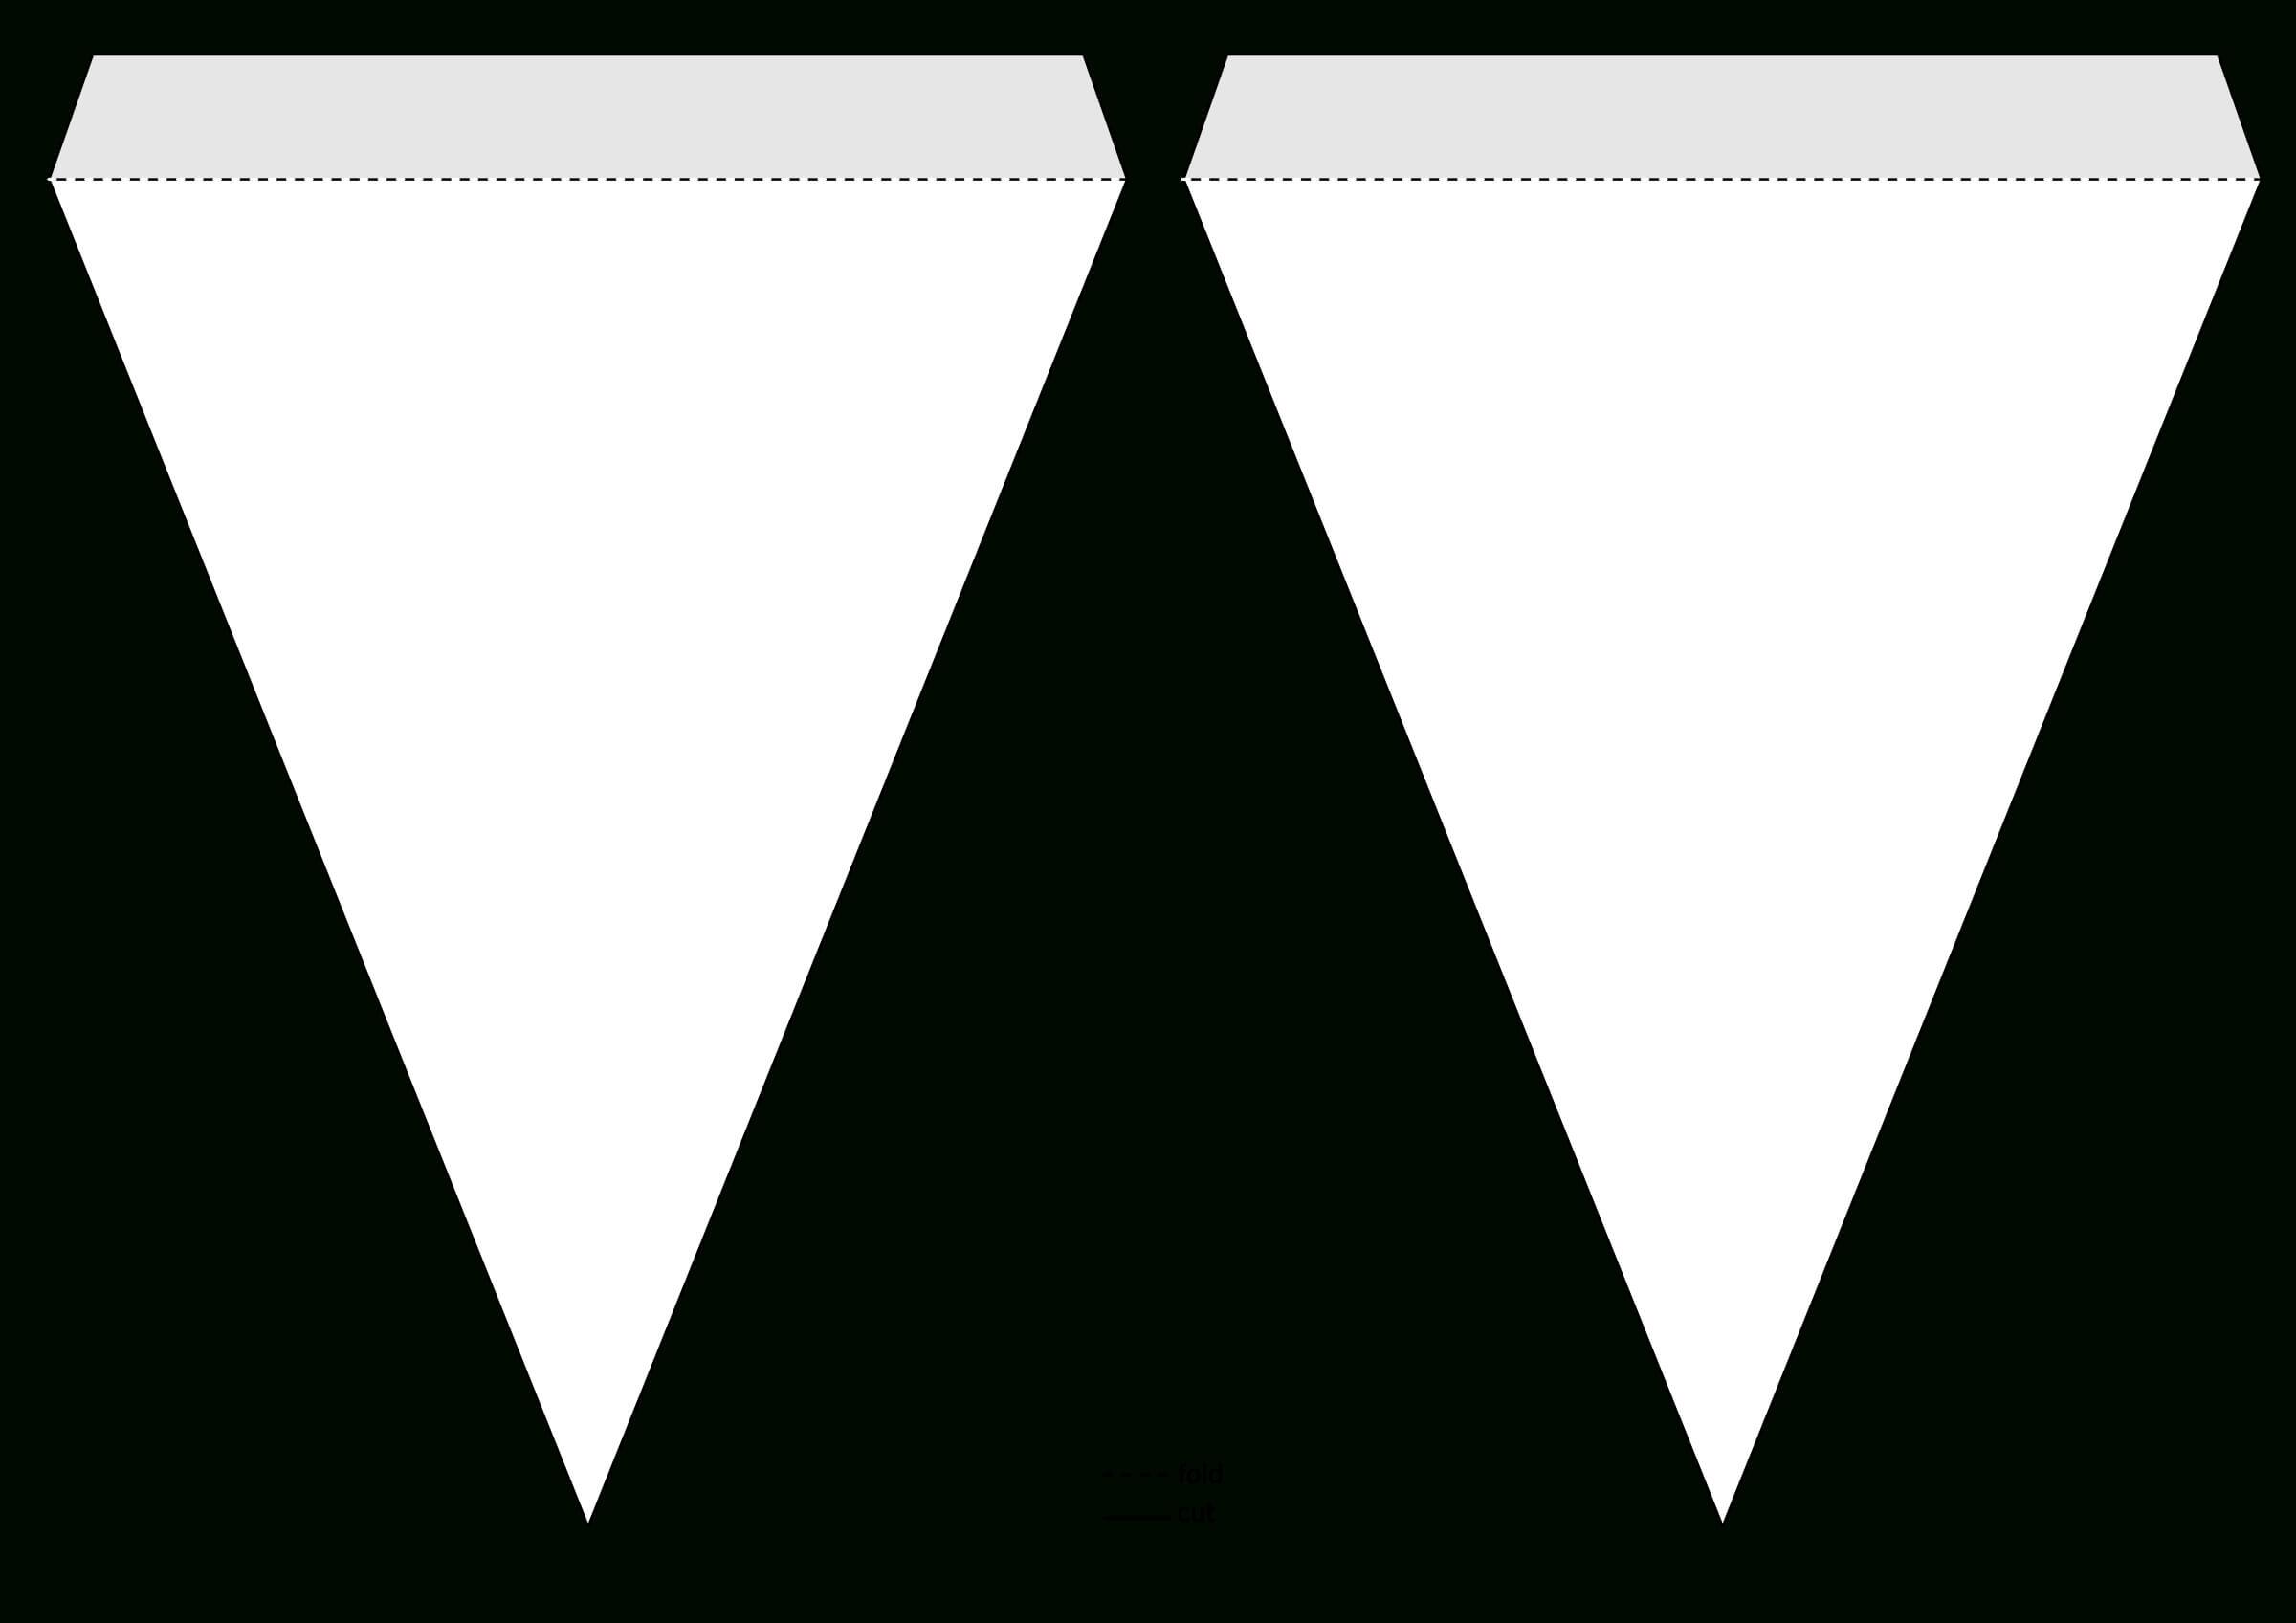 Triangle Pennant Banner Template@grafixgrrl, This Is A For Triangle Pennant Banner Template